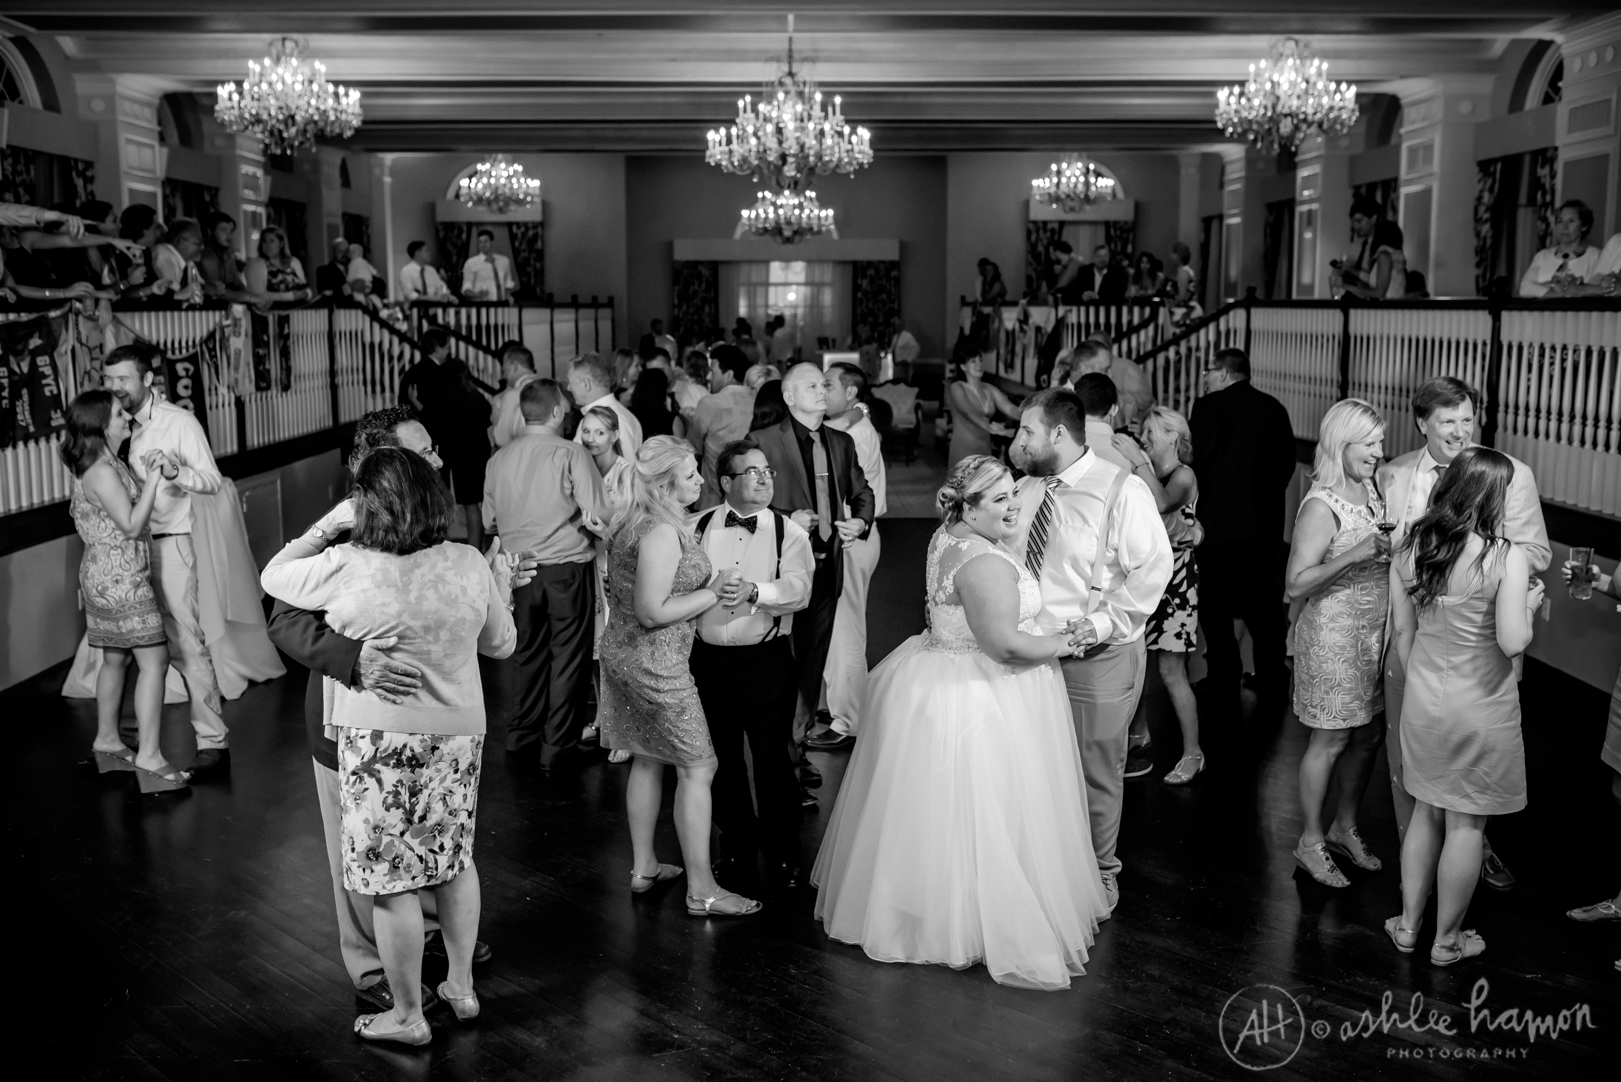 St-pete-wedding-photographer-don-caesar-ashlee-hamon_0034.jpg